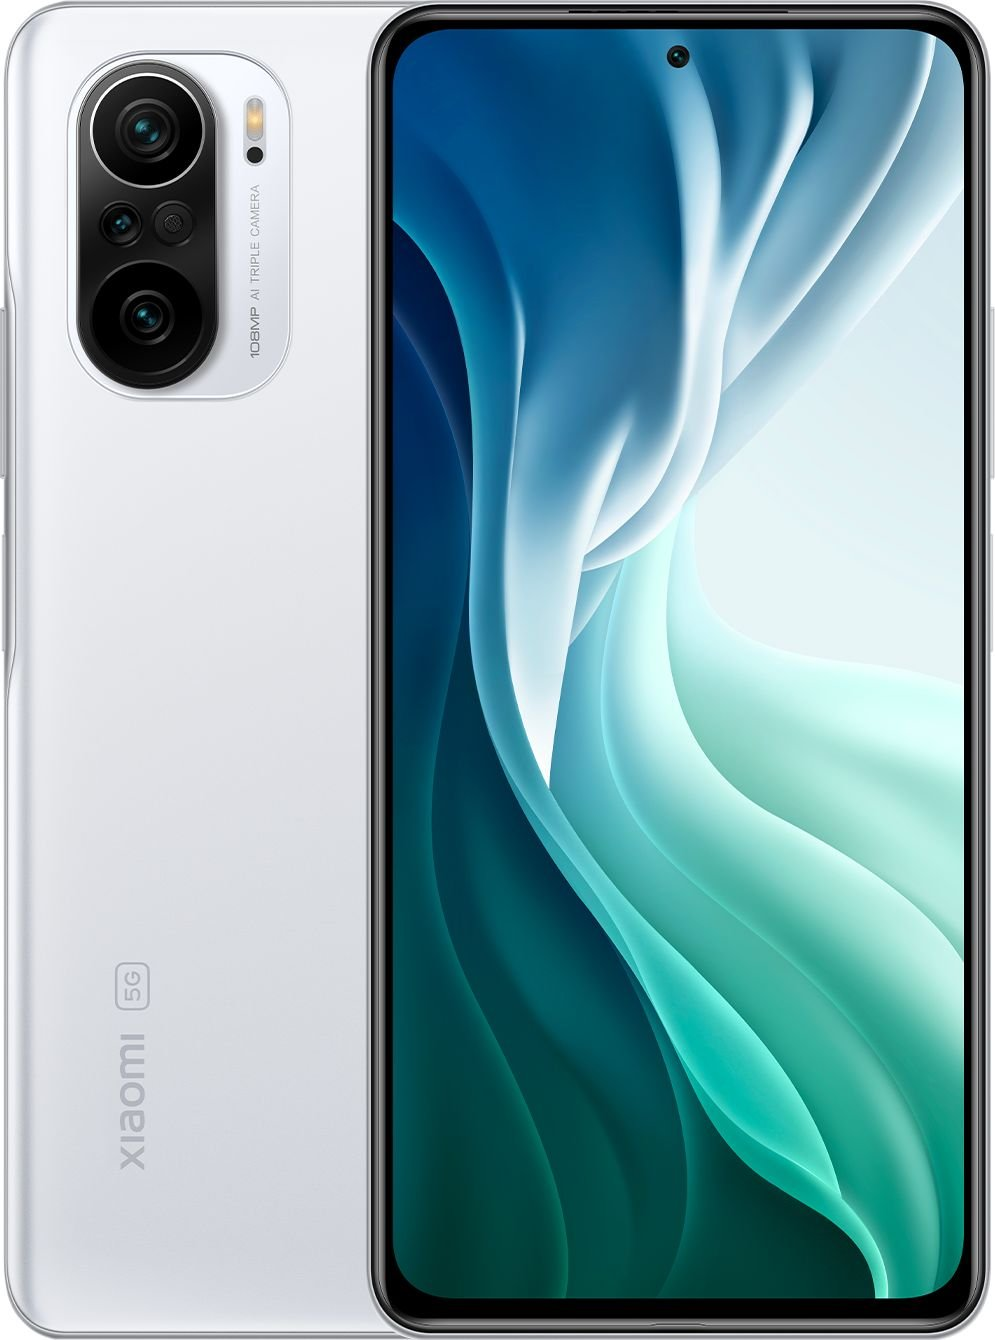 Smartfon Xiaomi Mi 11i 5G 8/256GB Dual SIM Bialy  (32768) 32768 Mobilais Telefons